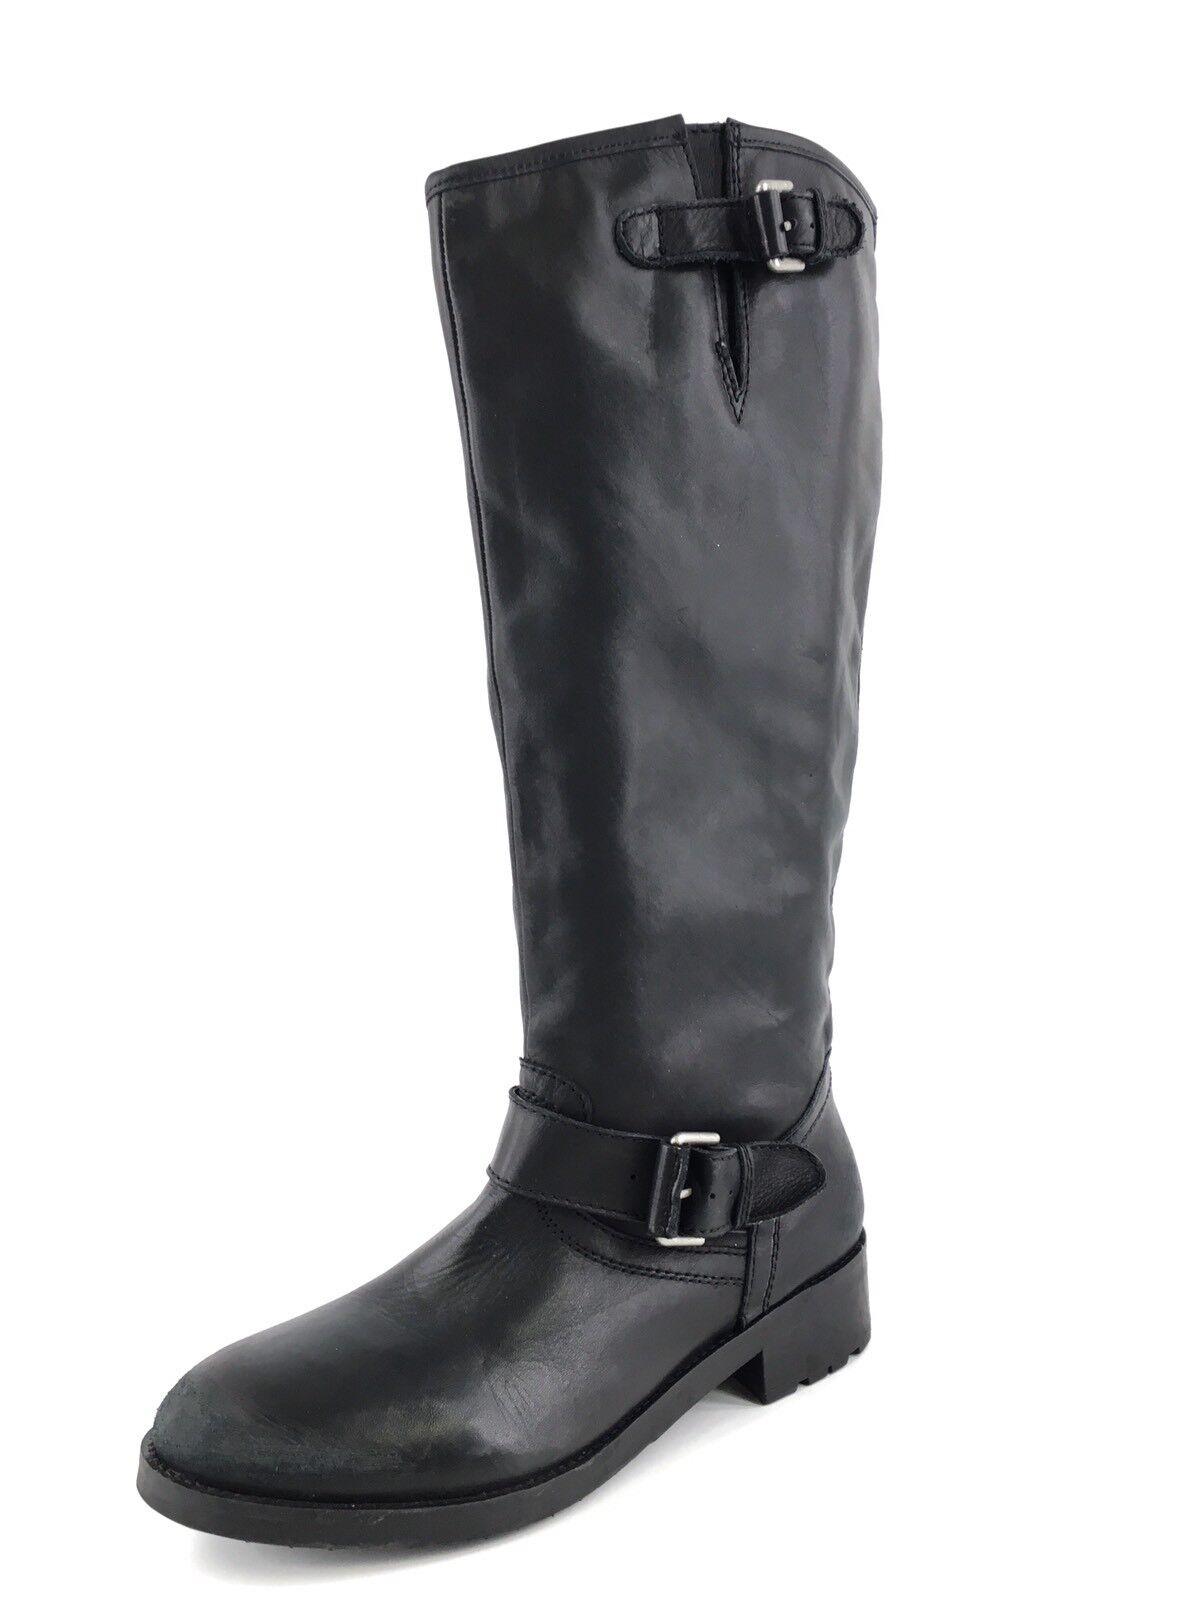 Kurt Geiger Black Leather Knee High Buckle Riding Boots Women's Size 42 M  550